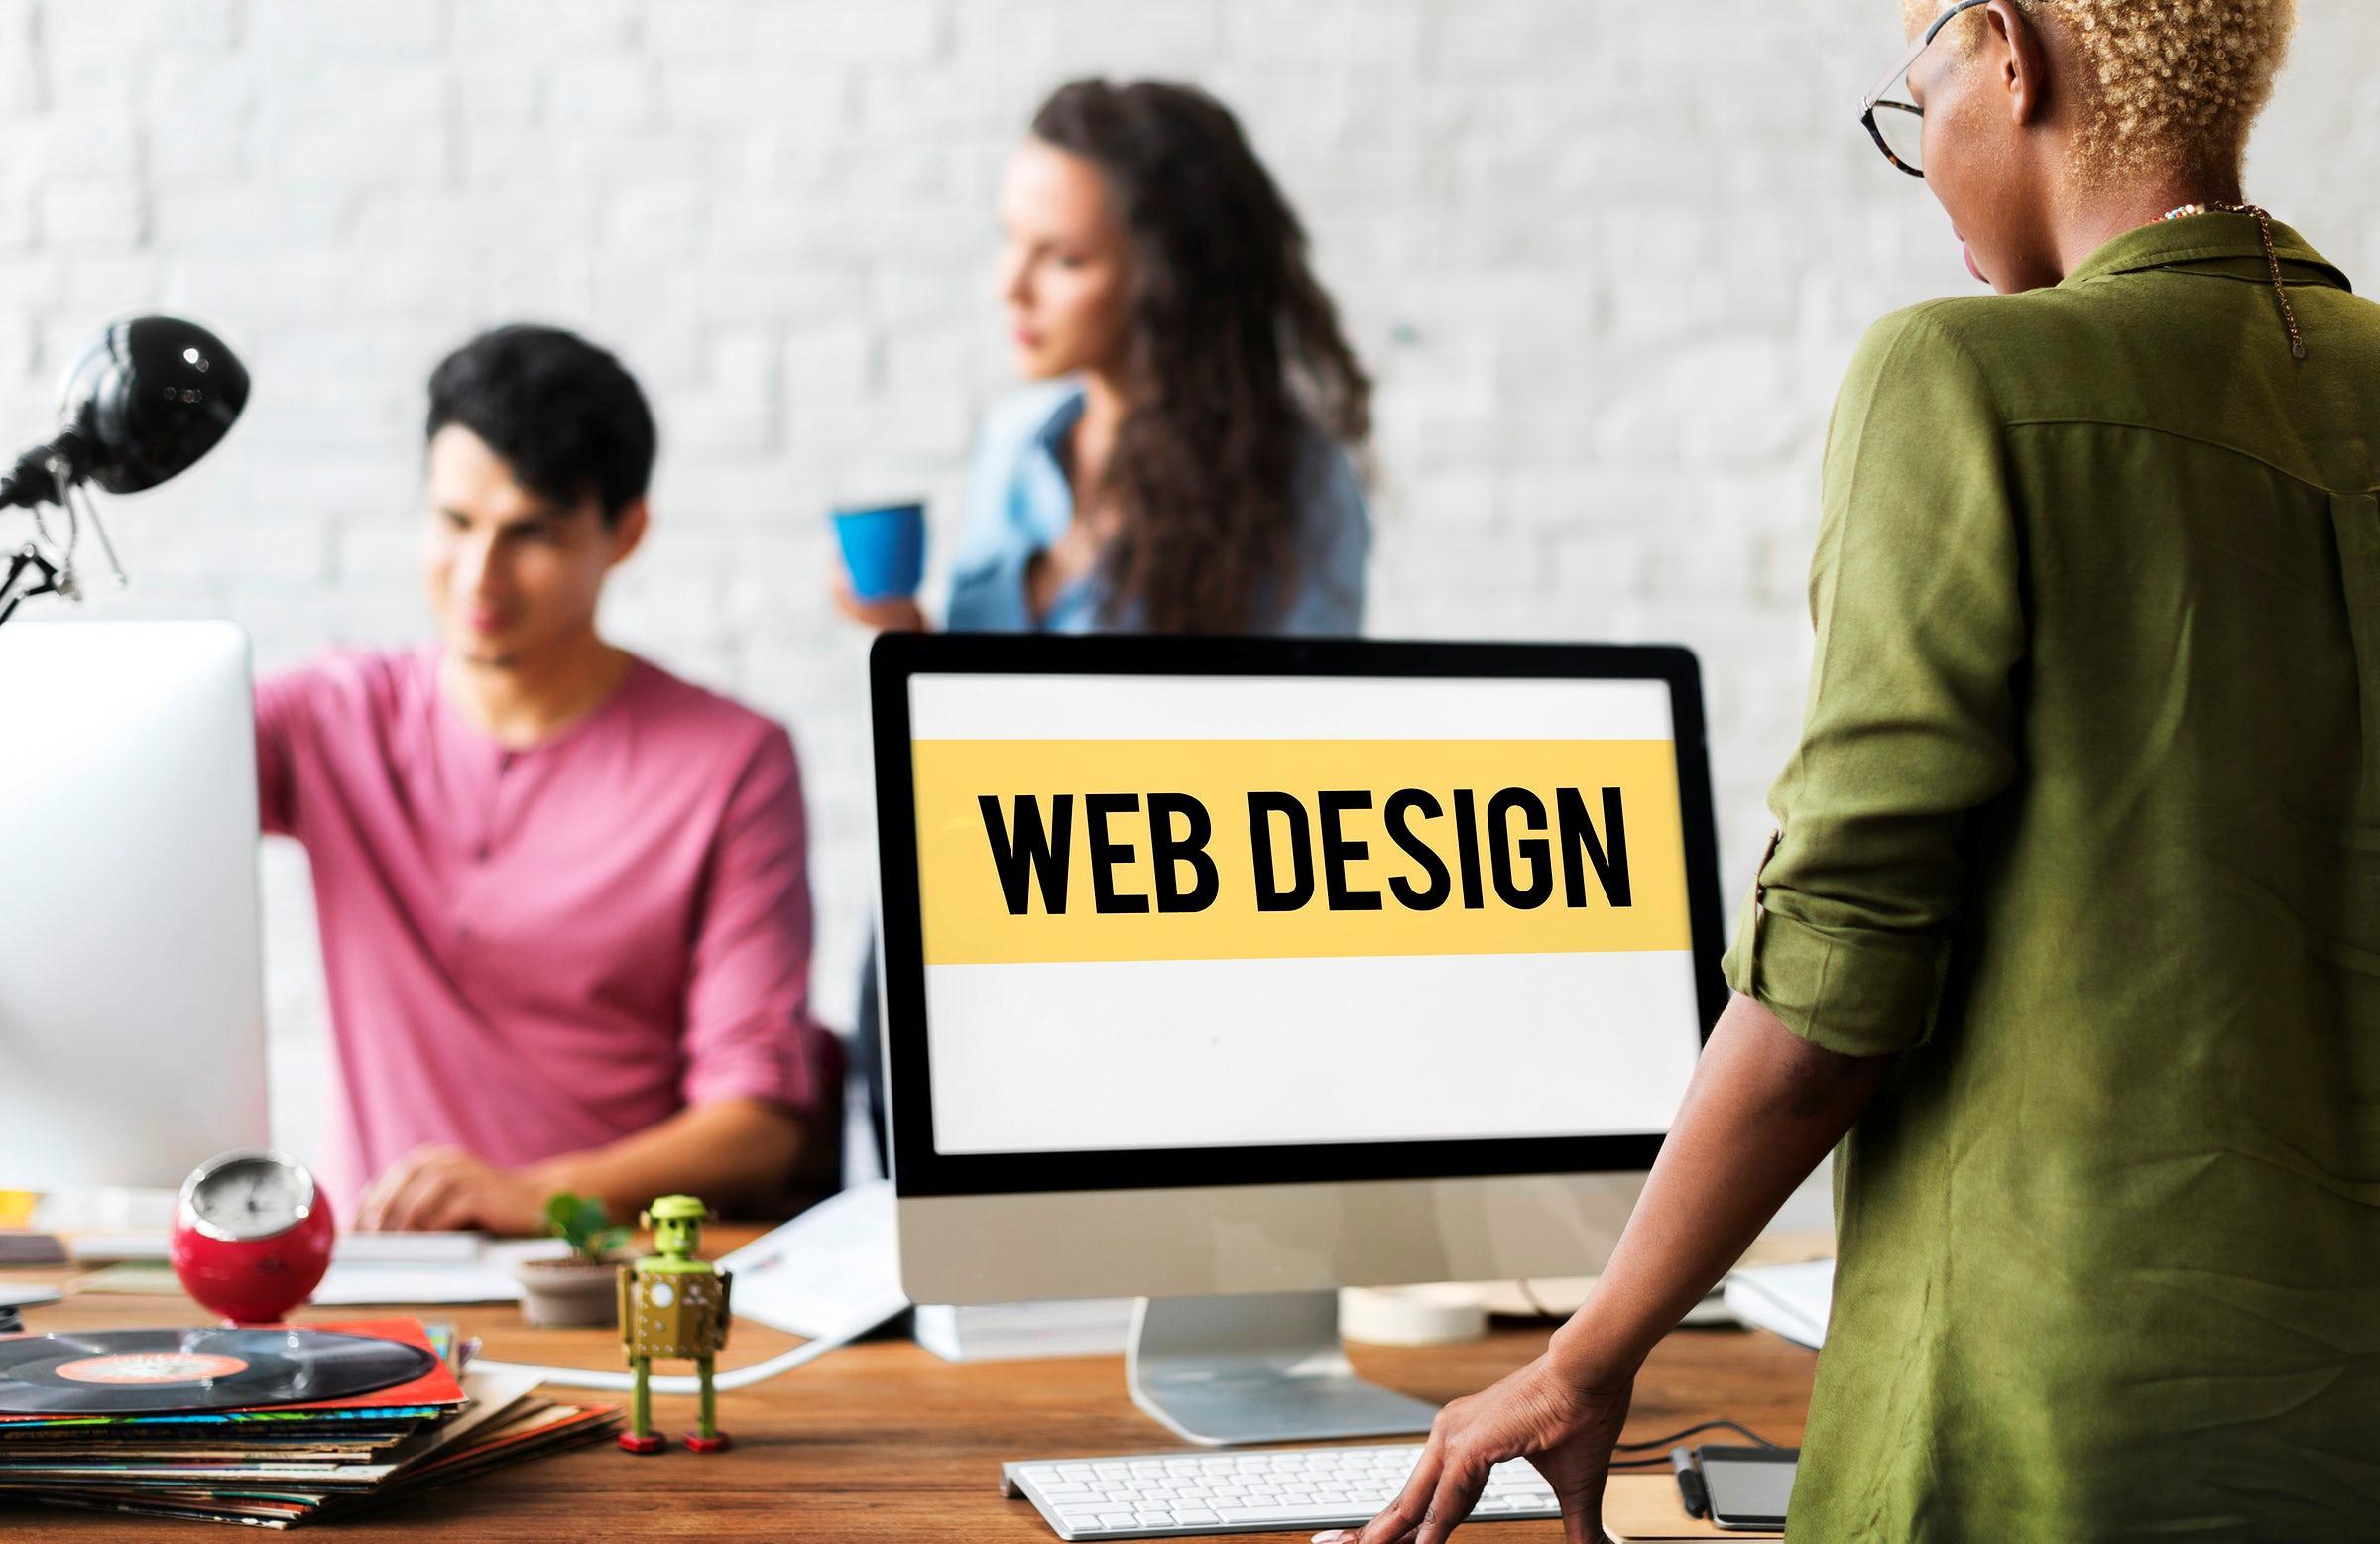 k-s5-bb-1-lyj4049-webdesign